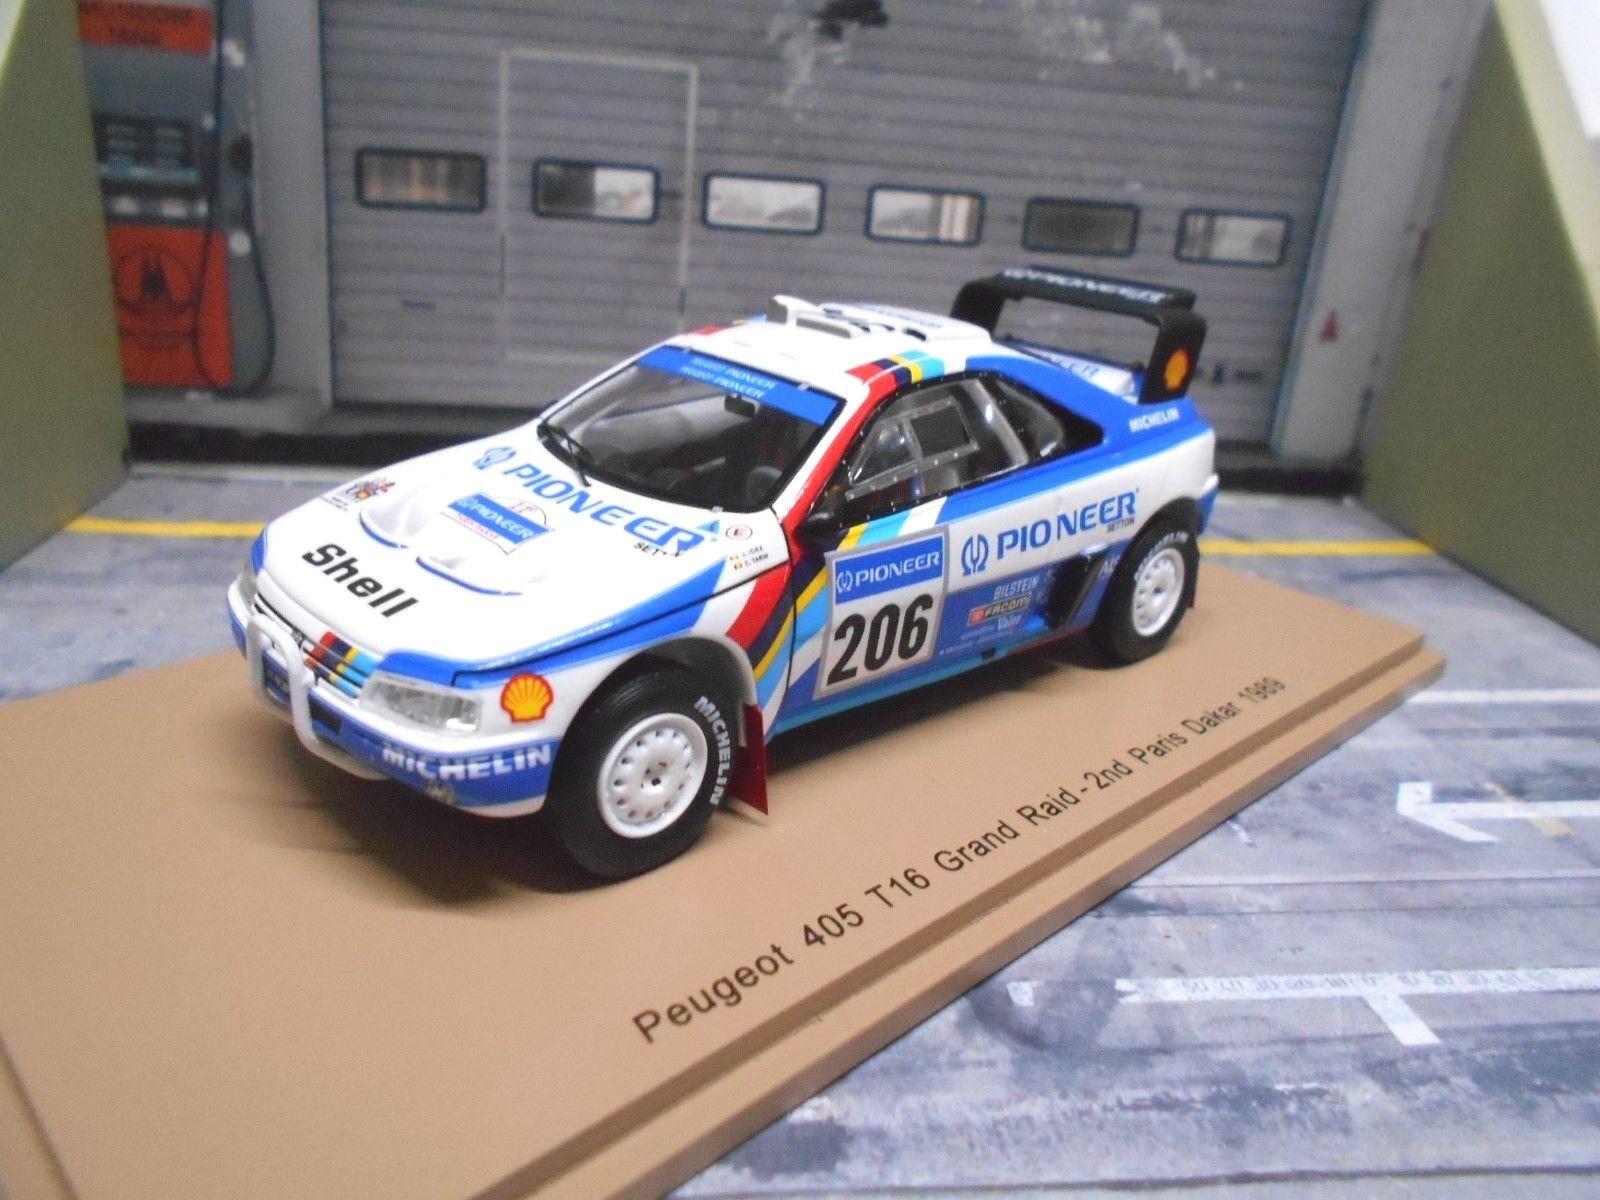 Peugeot Peugeot Peugeot 405 t16 RALLYE RAID PARIS DAKAR 1989 #206 Ickx Pioneer Spark Resin 1:43 | Forme élégante  508600